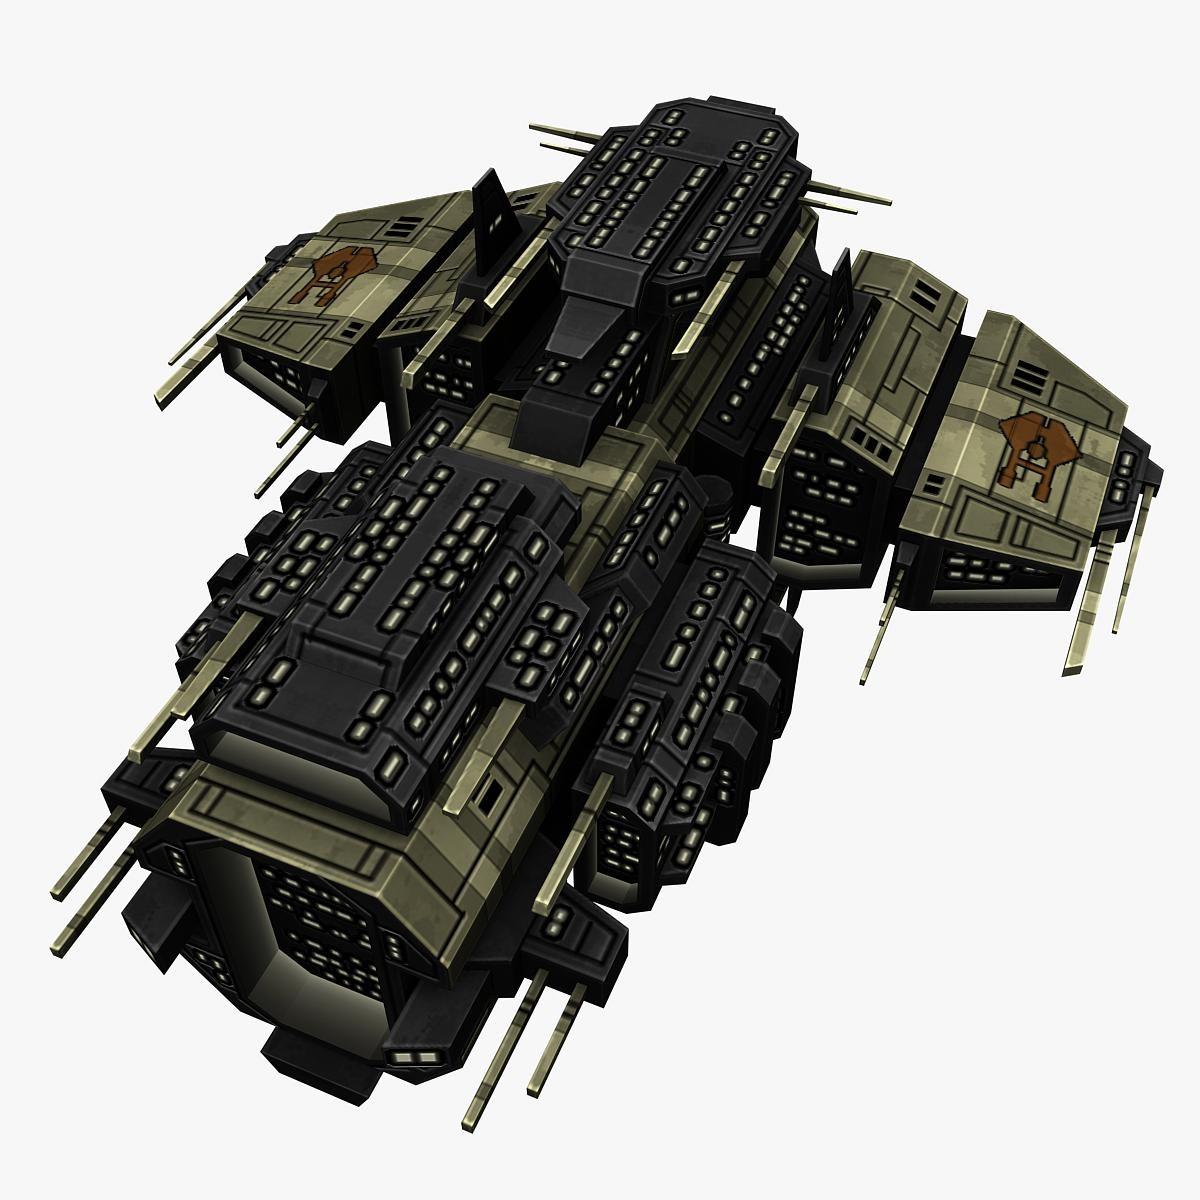 battleship_destroyer_5_upgraded_preview_0.jpg